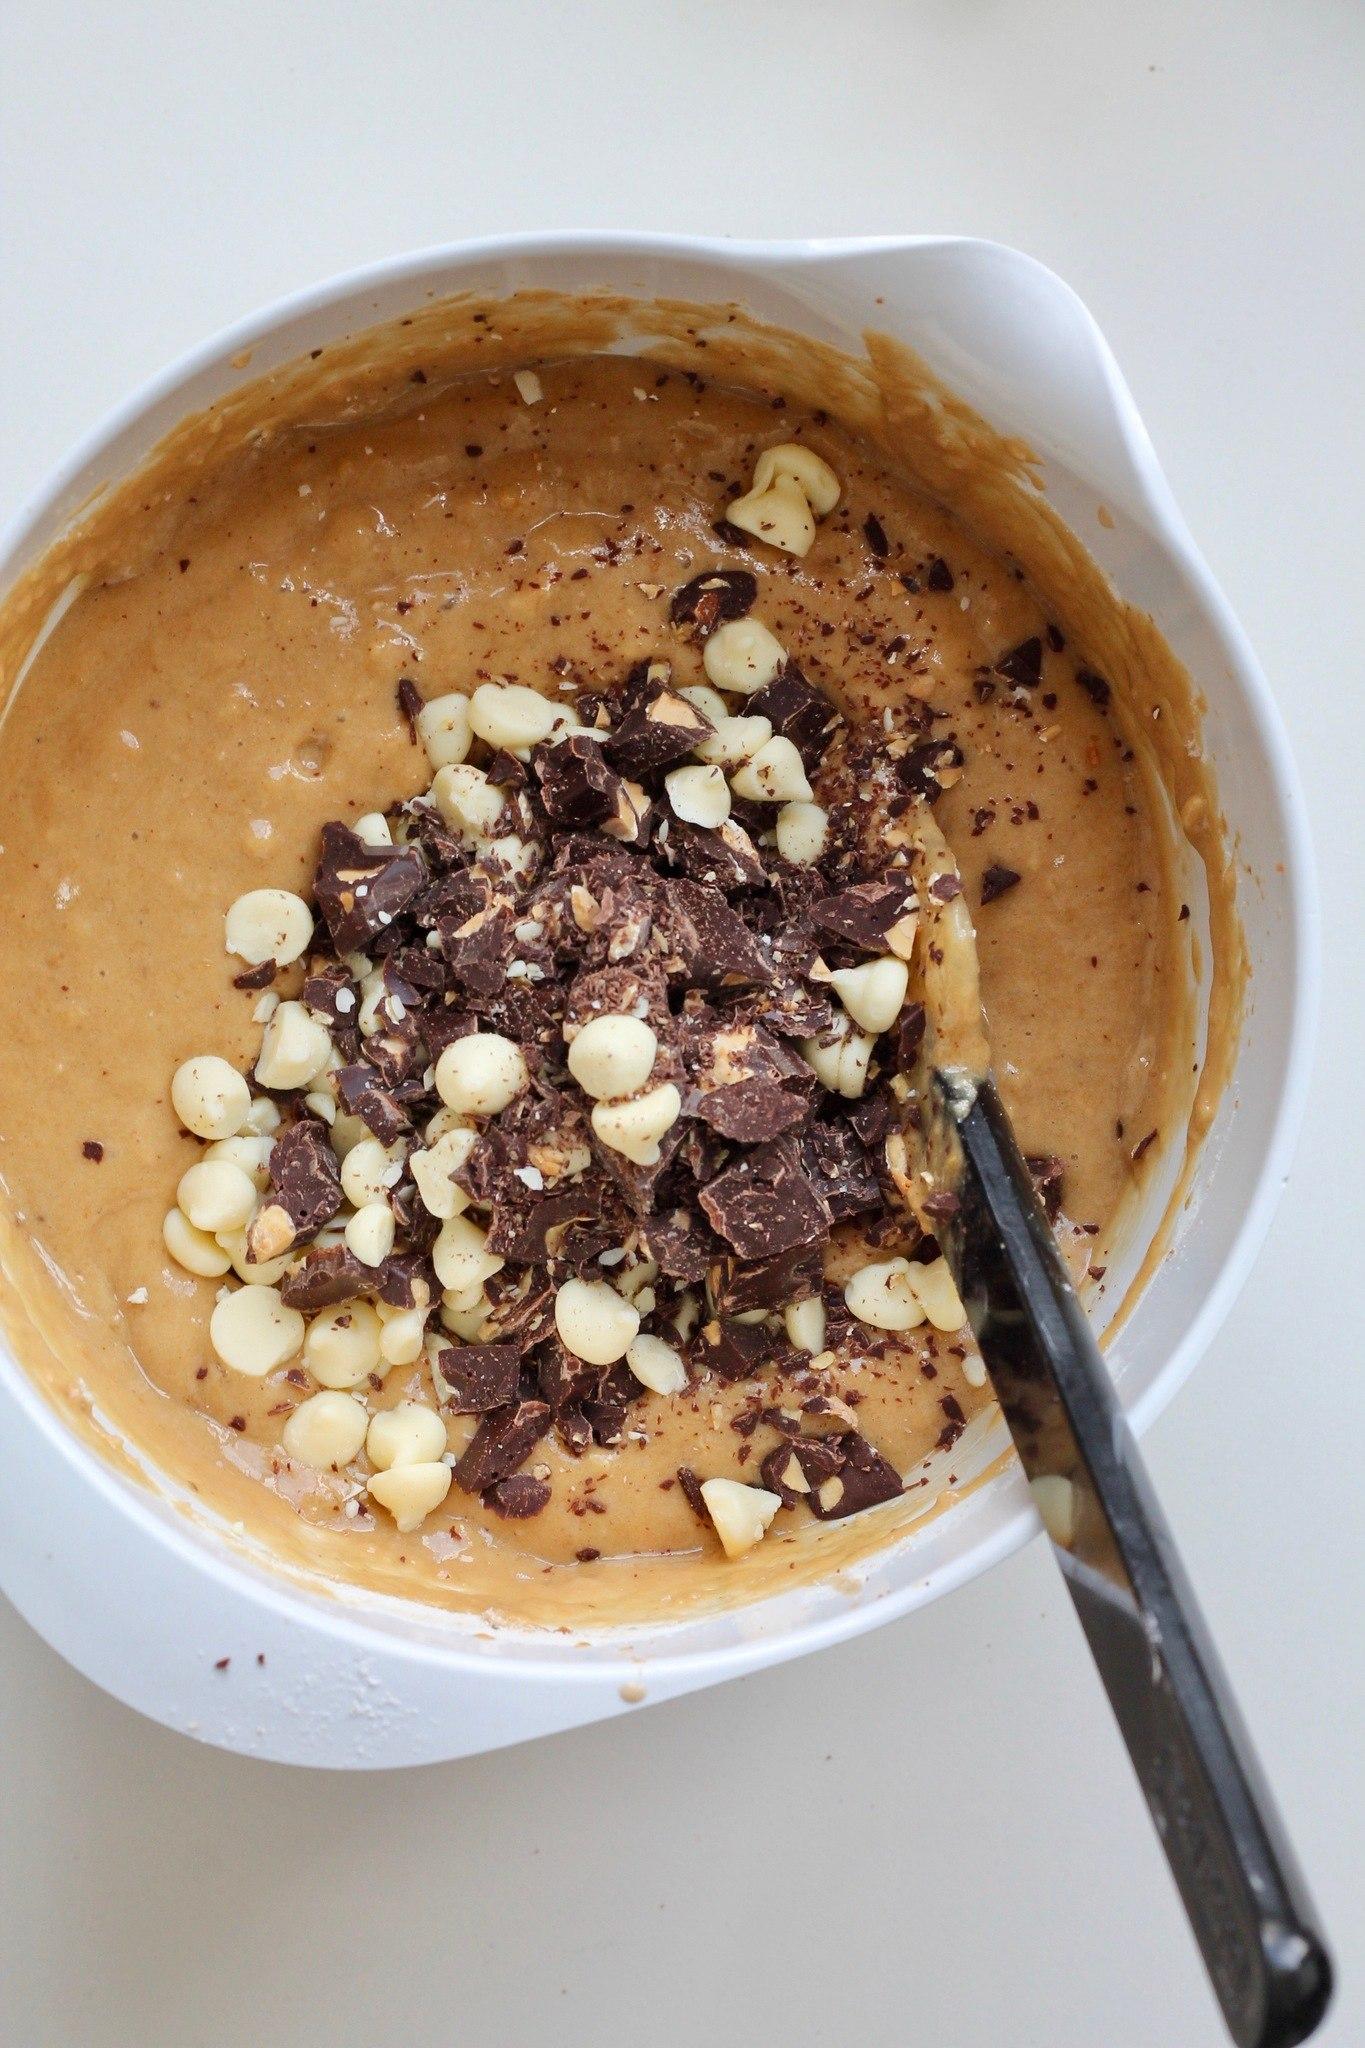 Bananbrød med peanutbutter og chokolade